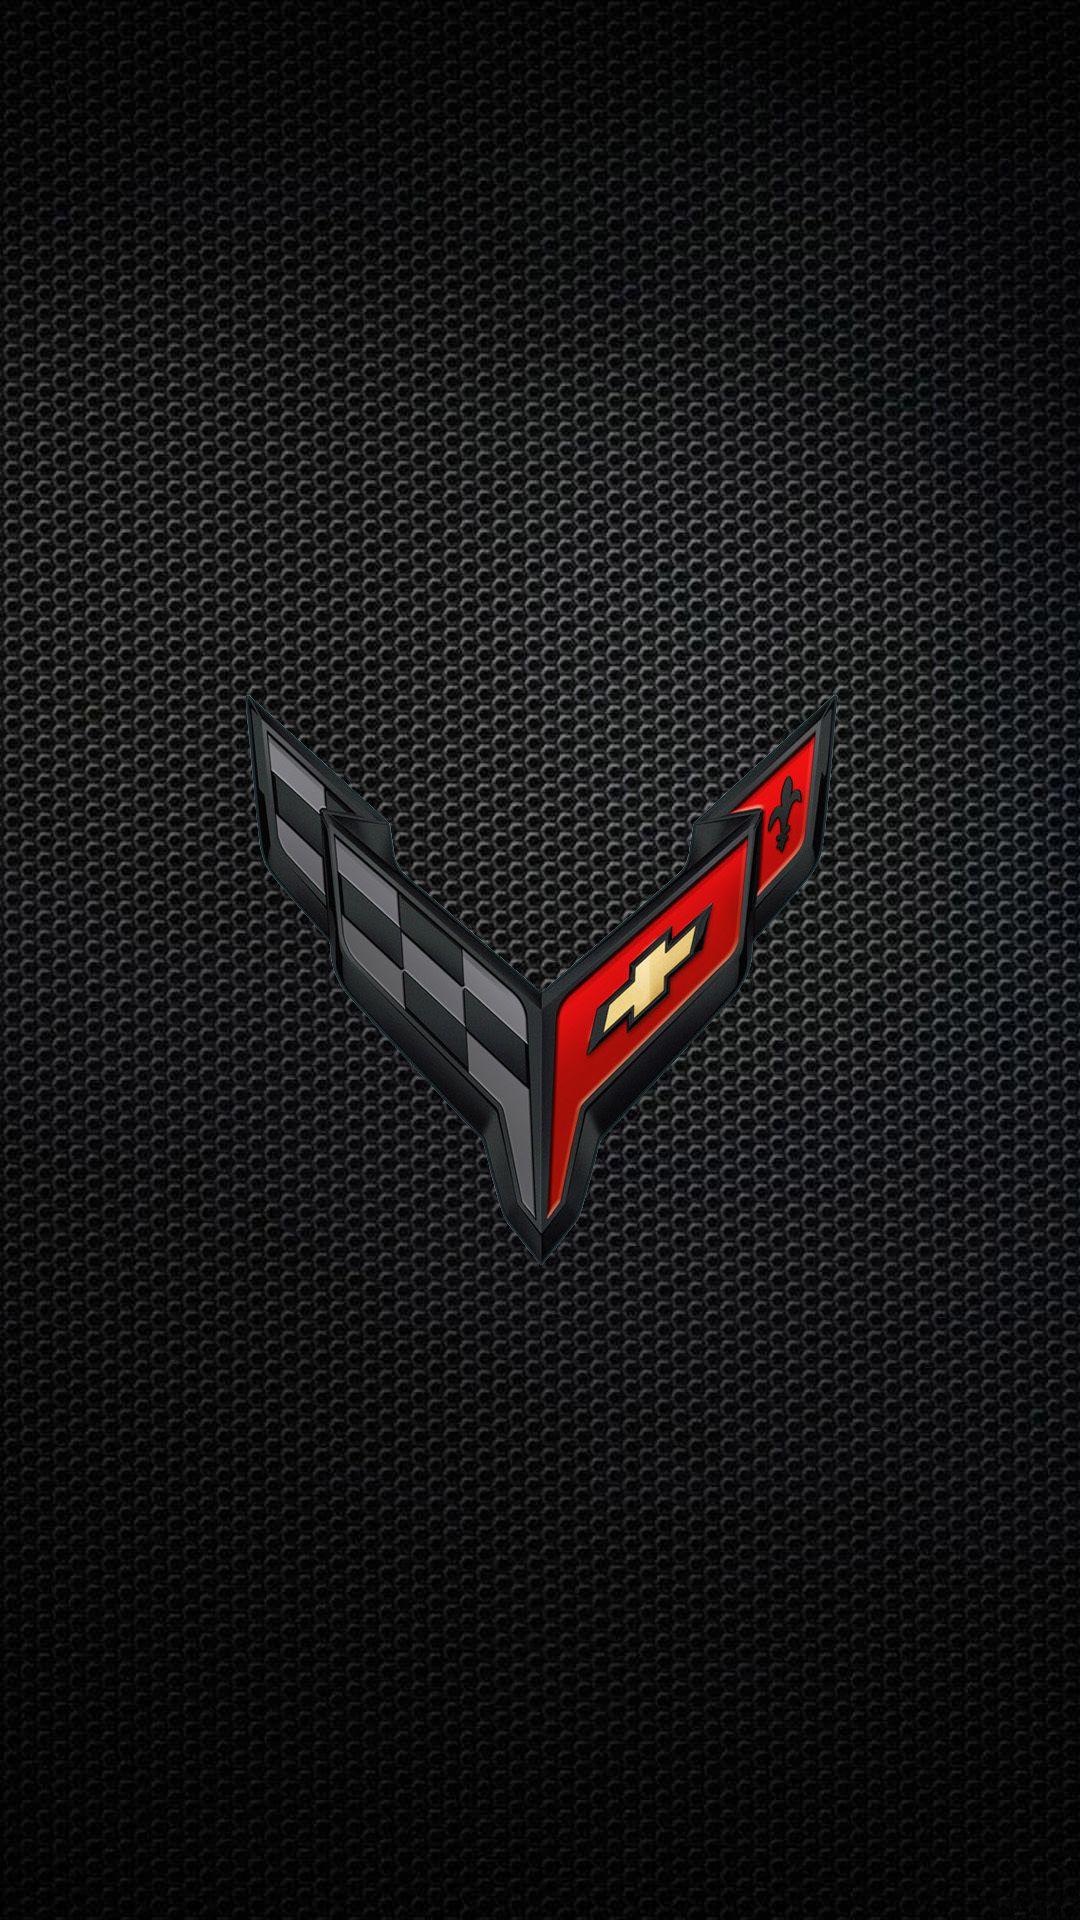 C8 Corvette IPhone Wallpapers